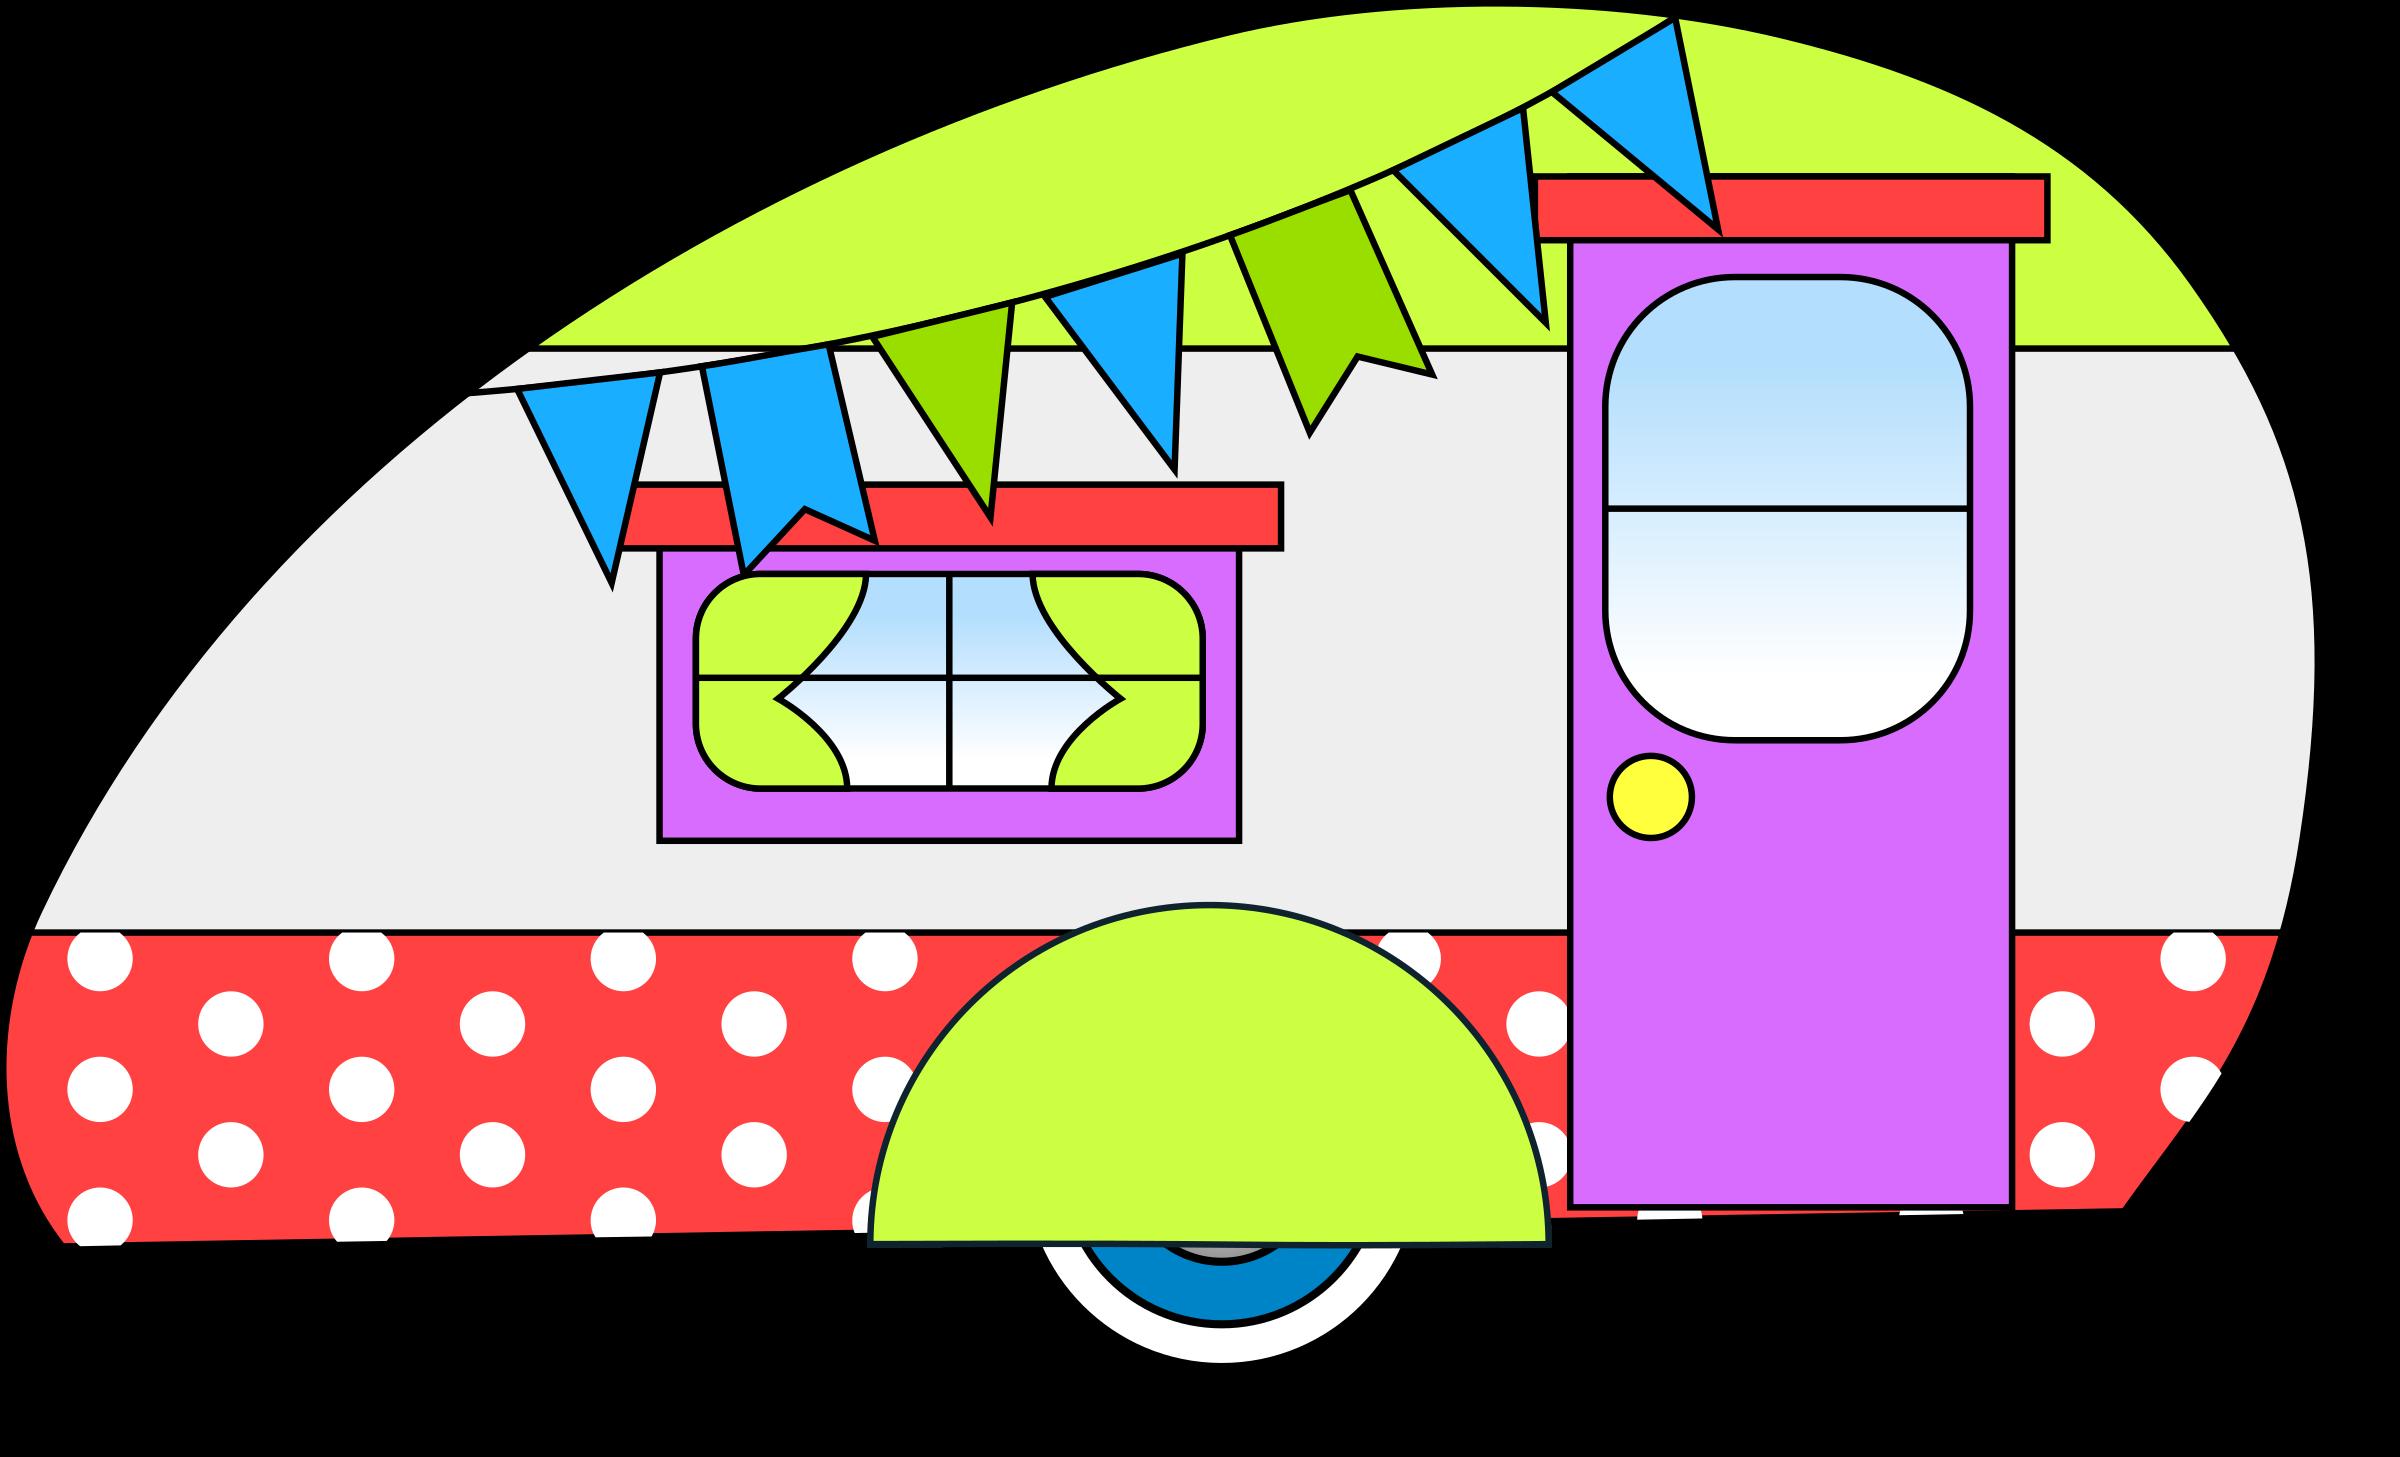 Camper clipart vintage camper. Retro cliparts free download